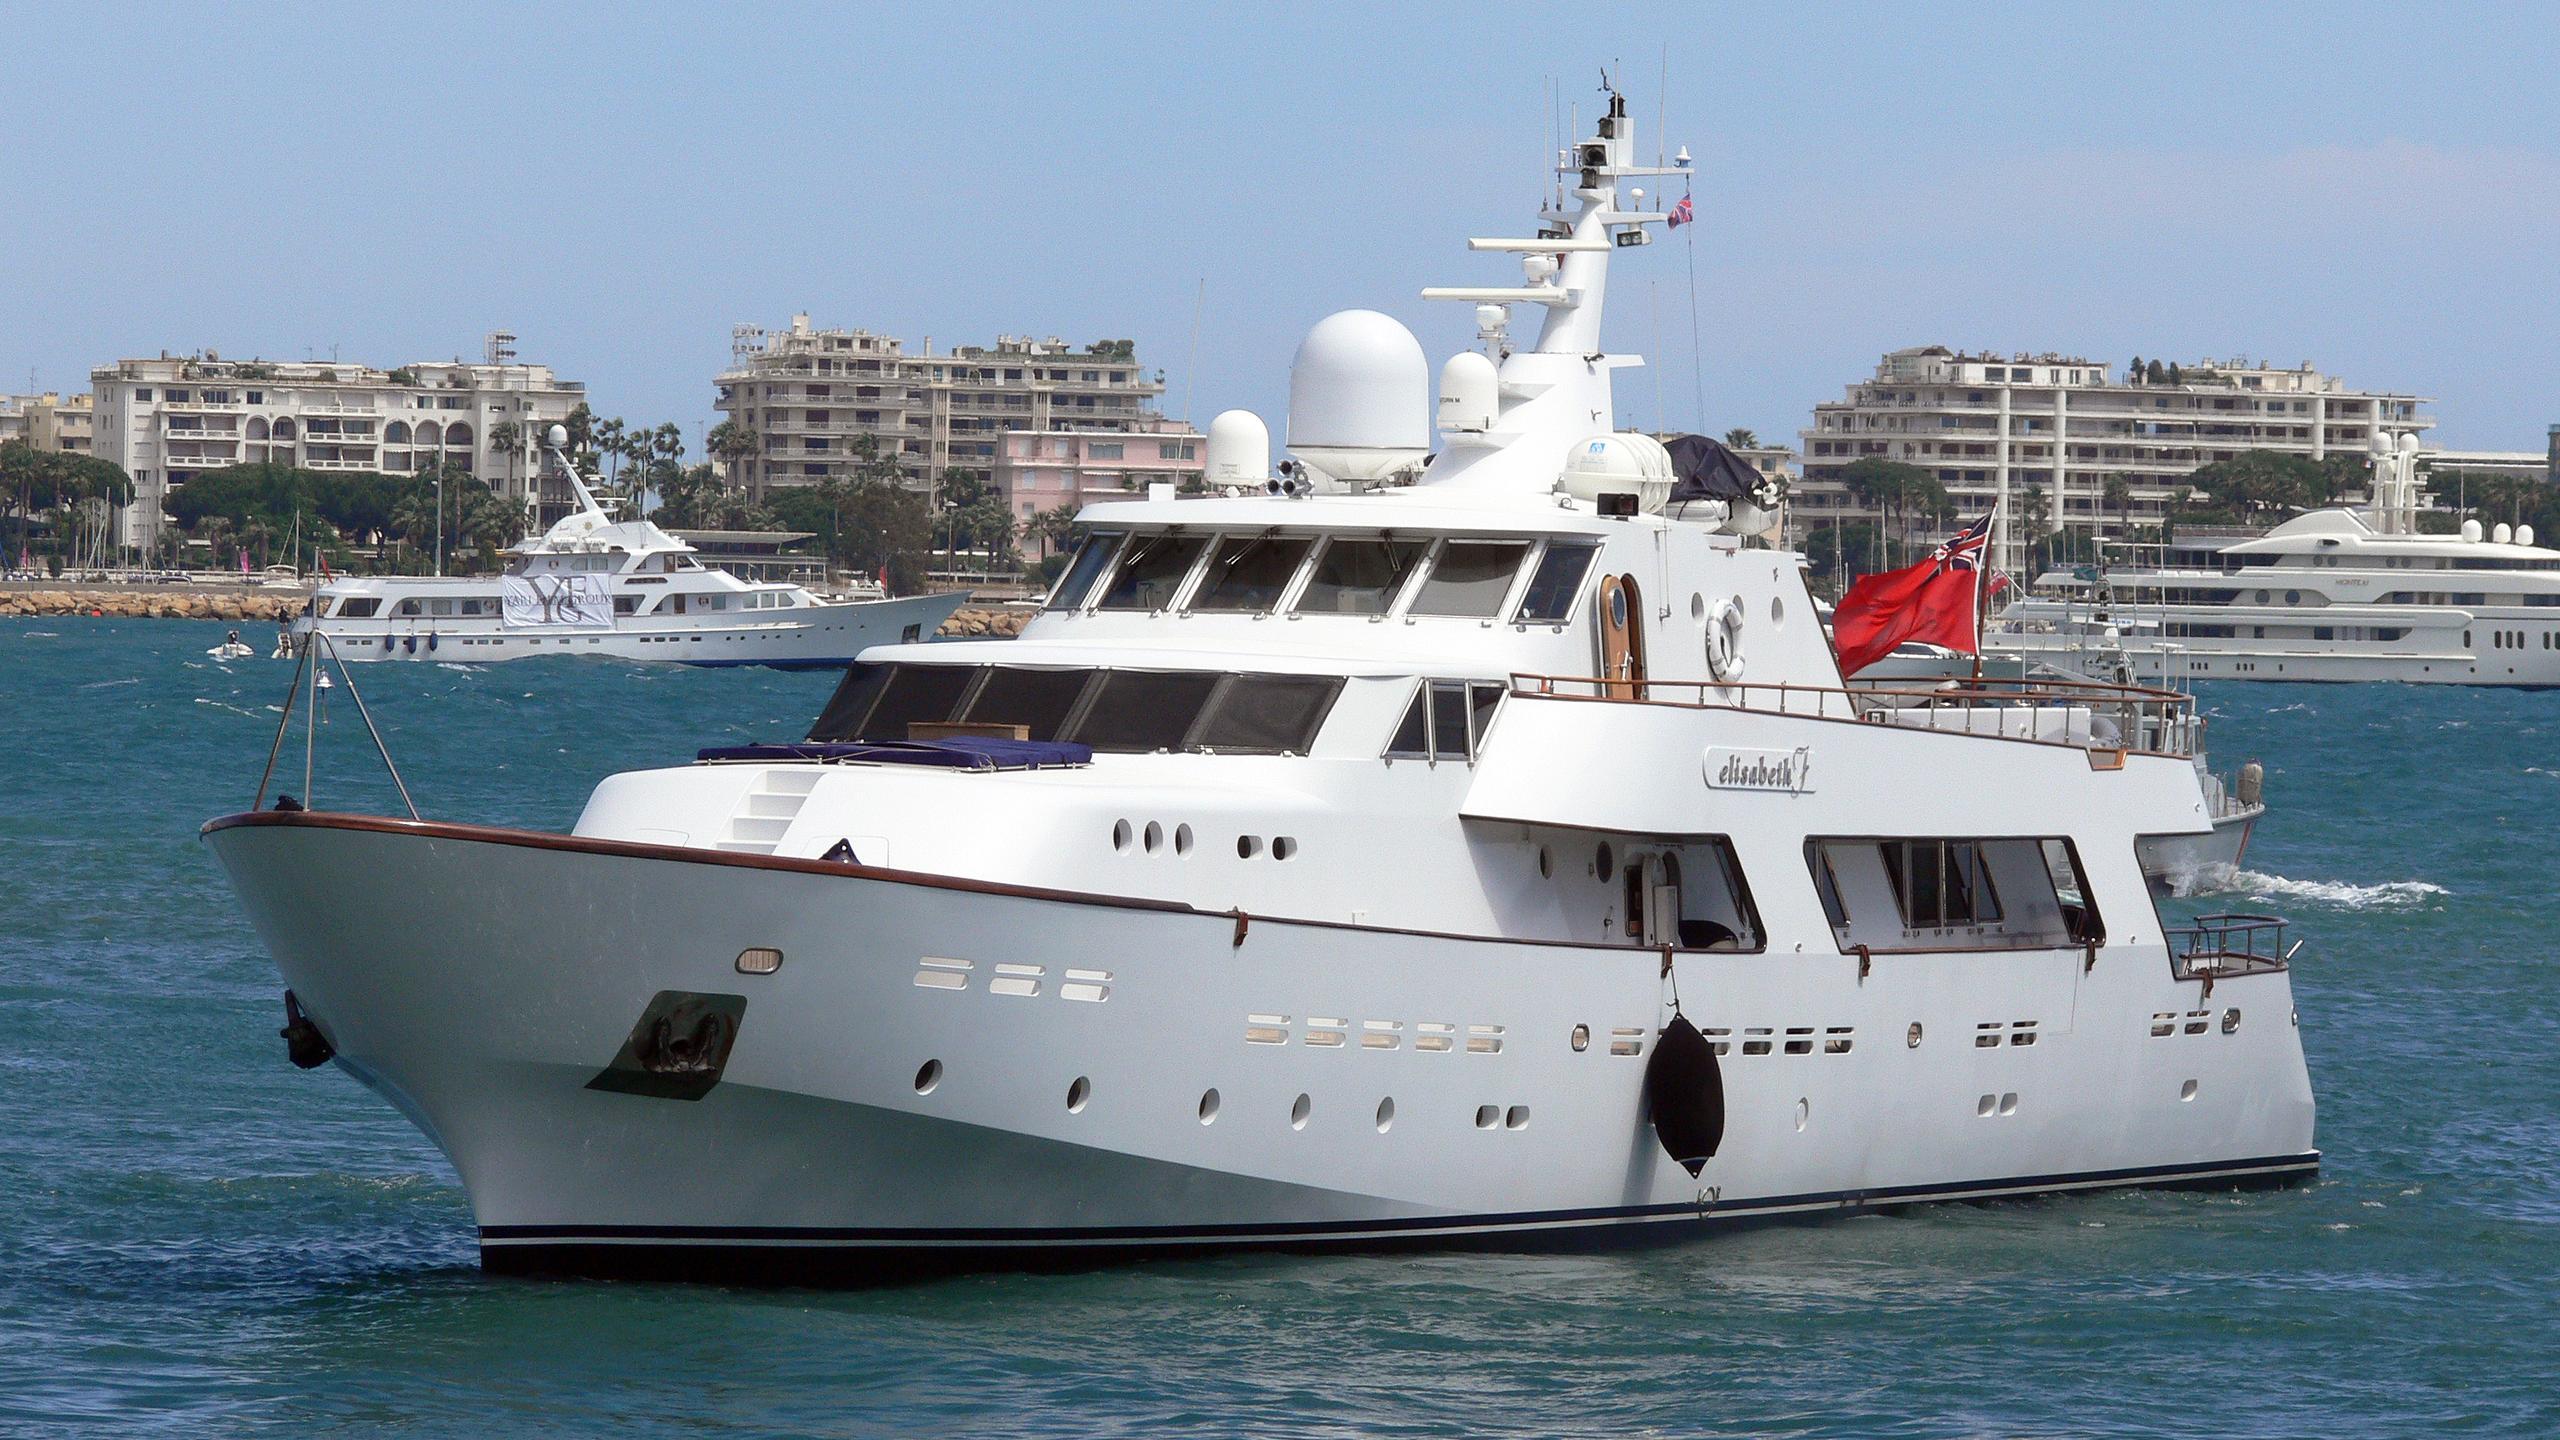 parvati-motor-yacht-crn-1979-38m-half-profile